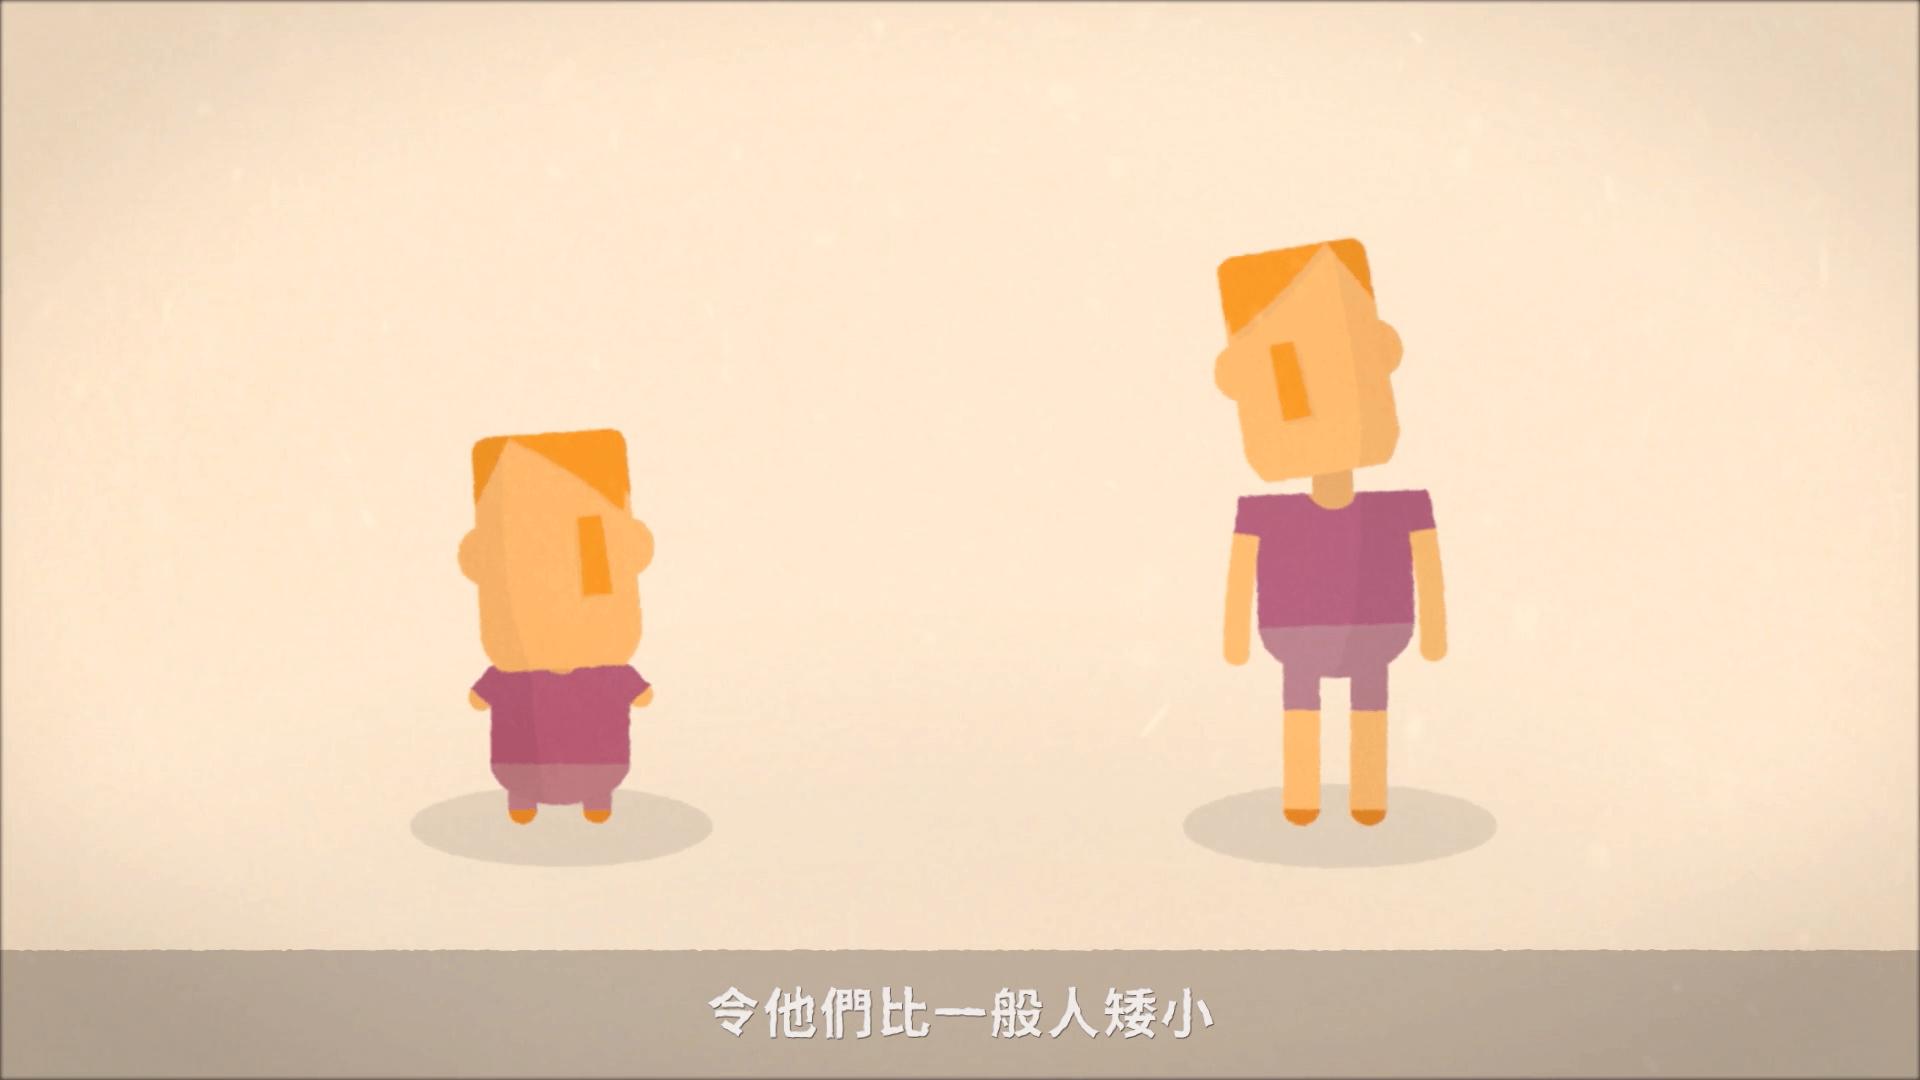 Little People of Hong Kong